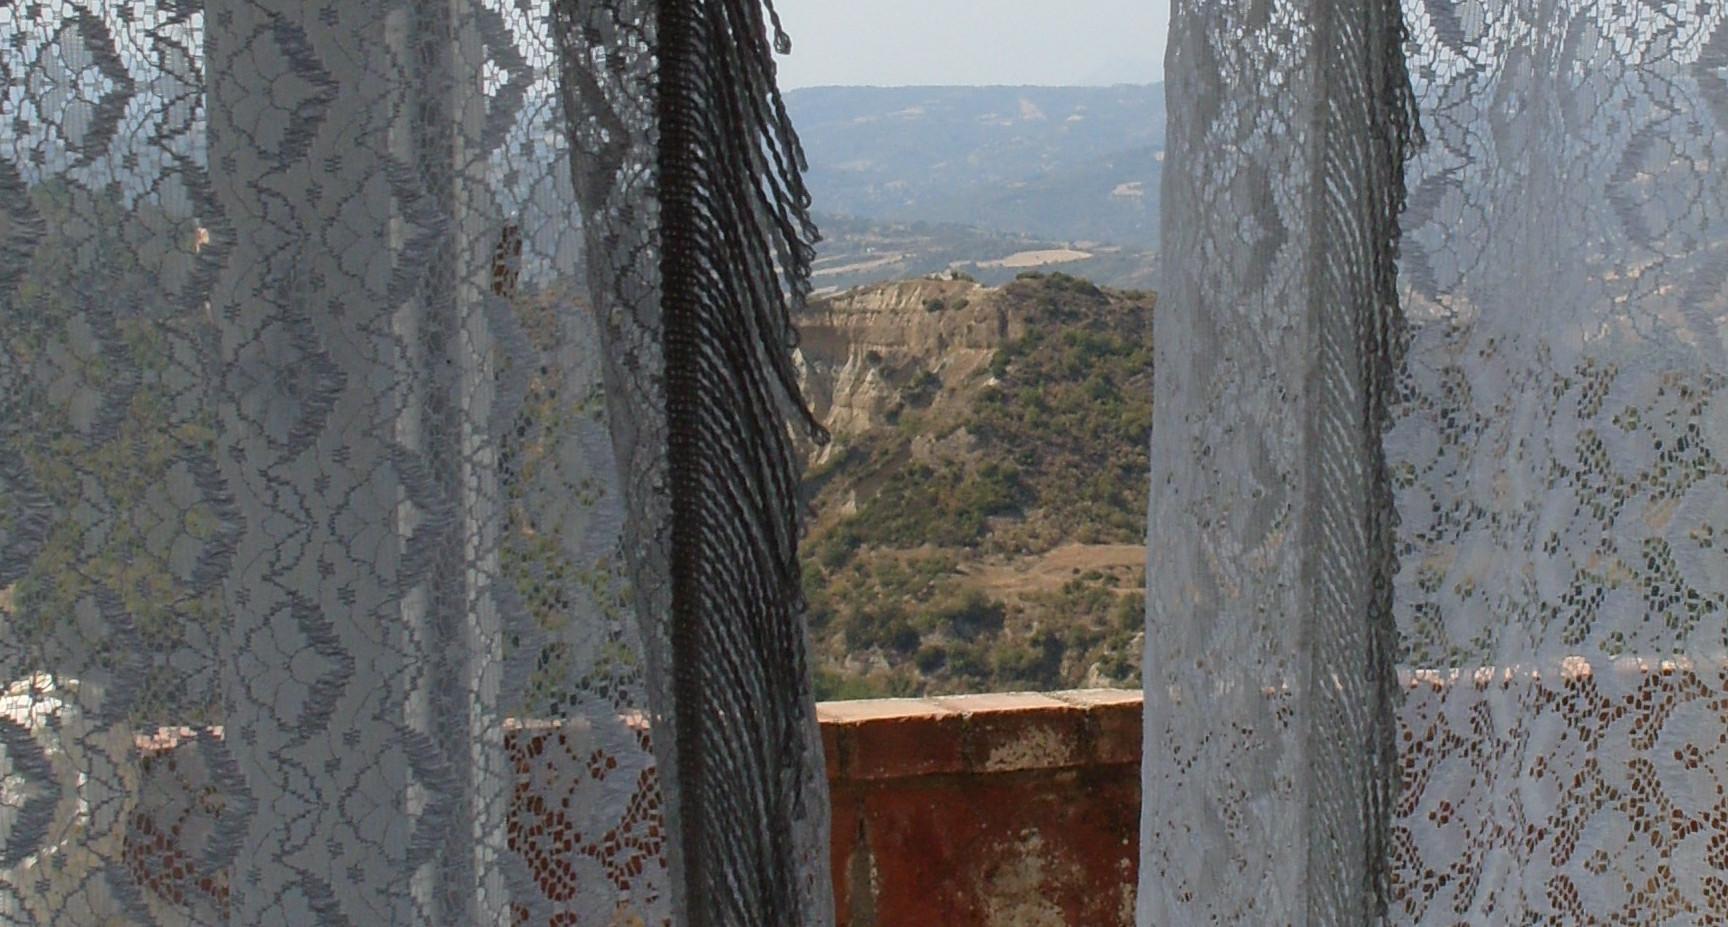 The view from Palazzo Rinaldi